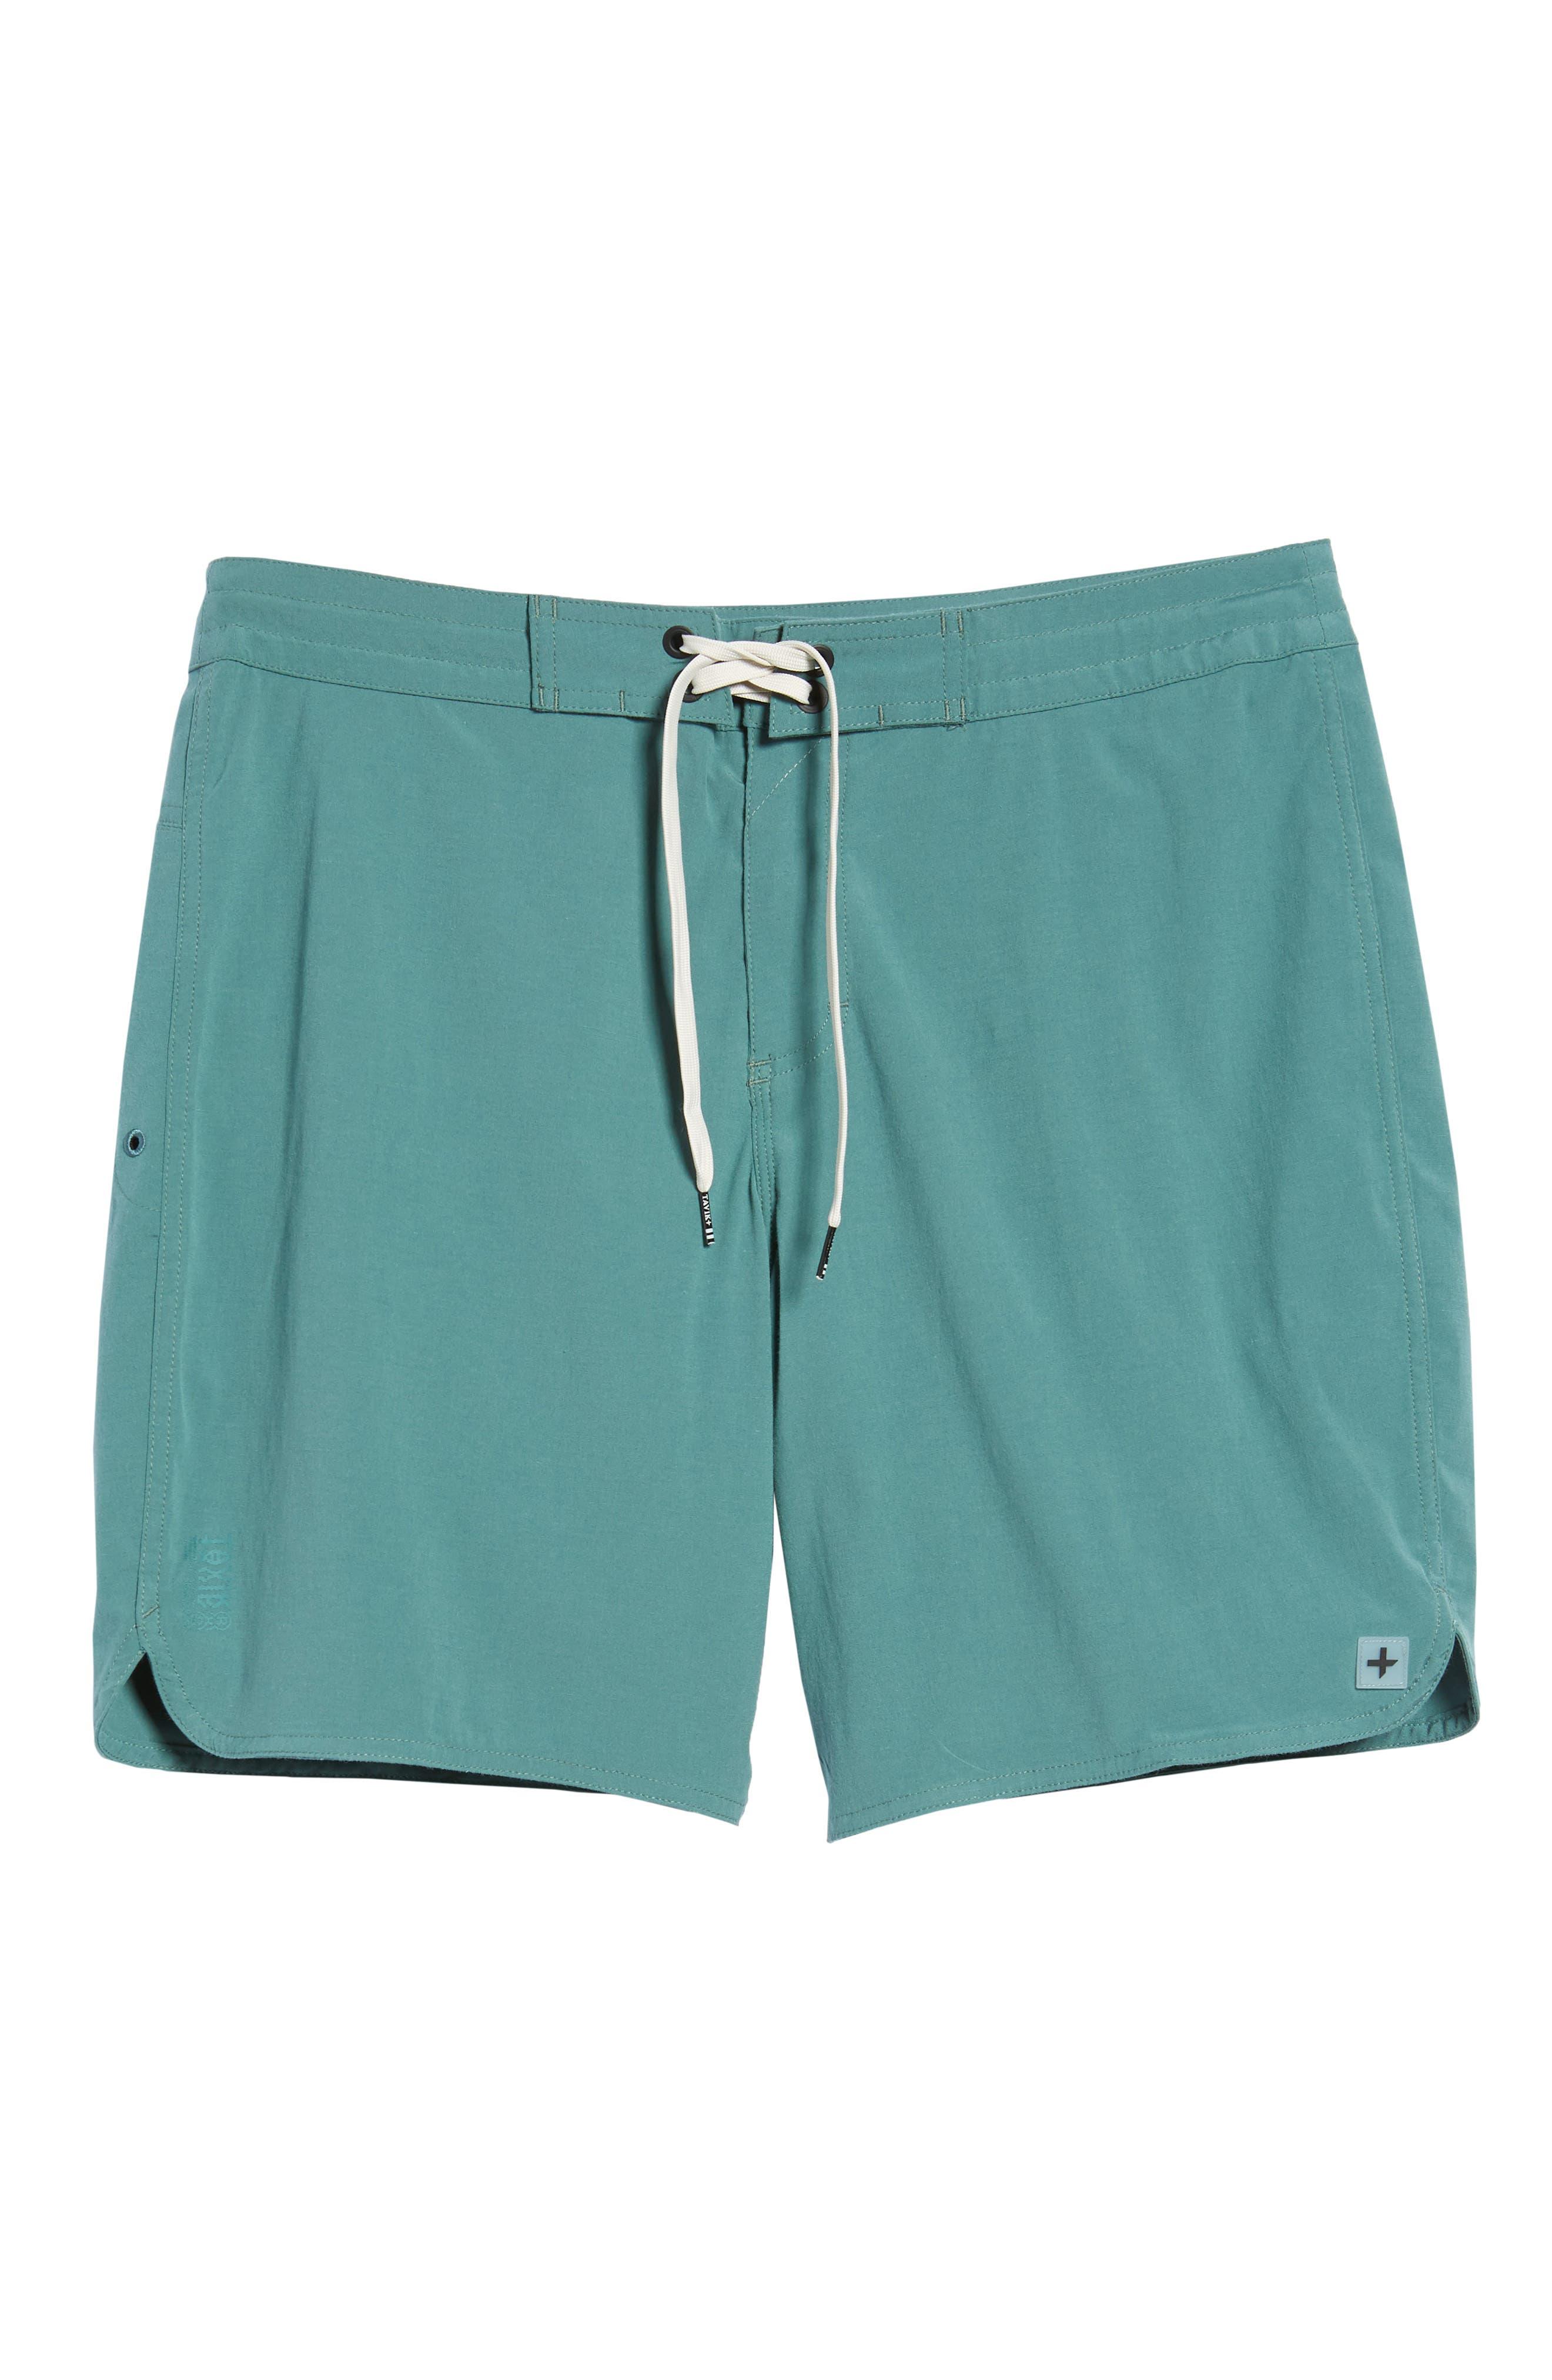 Avalon Board Shorts,                             Alternate thumbnail 6, color,                             Palm Green